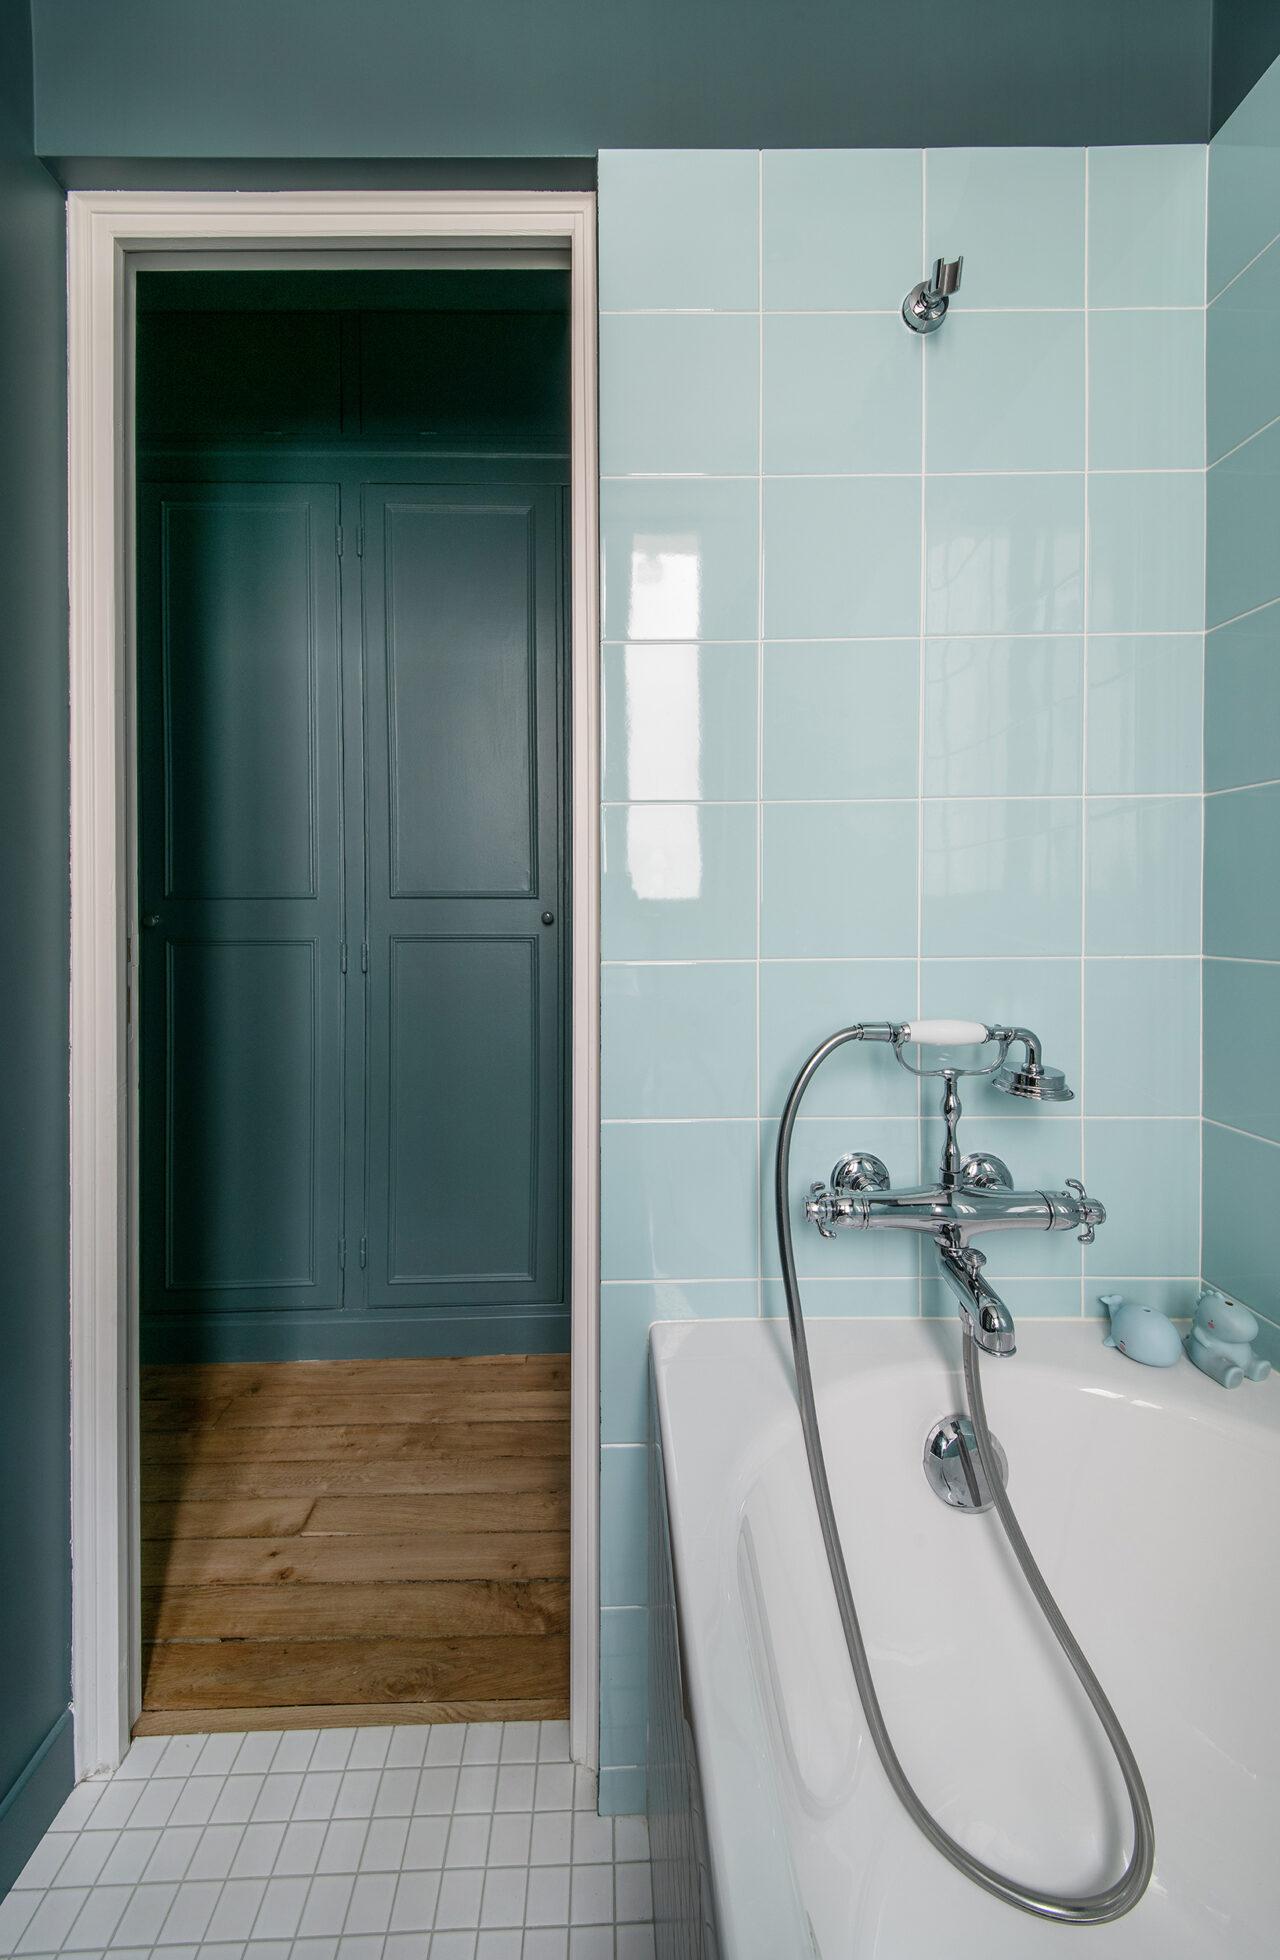 salle de bain bleu sur mesure robinet ancien